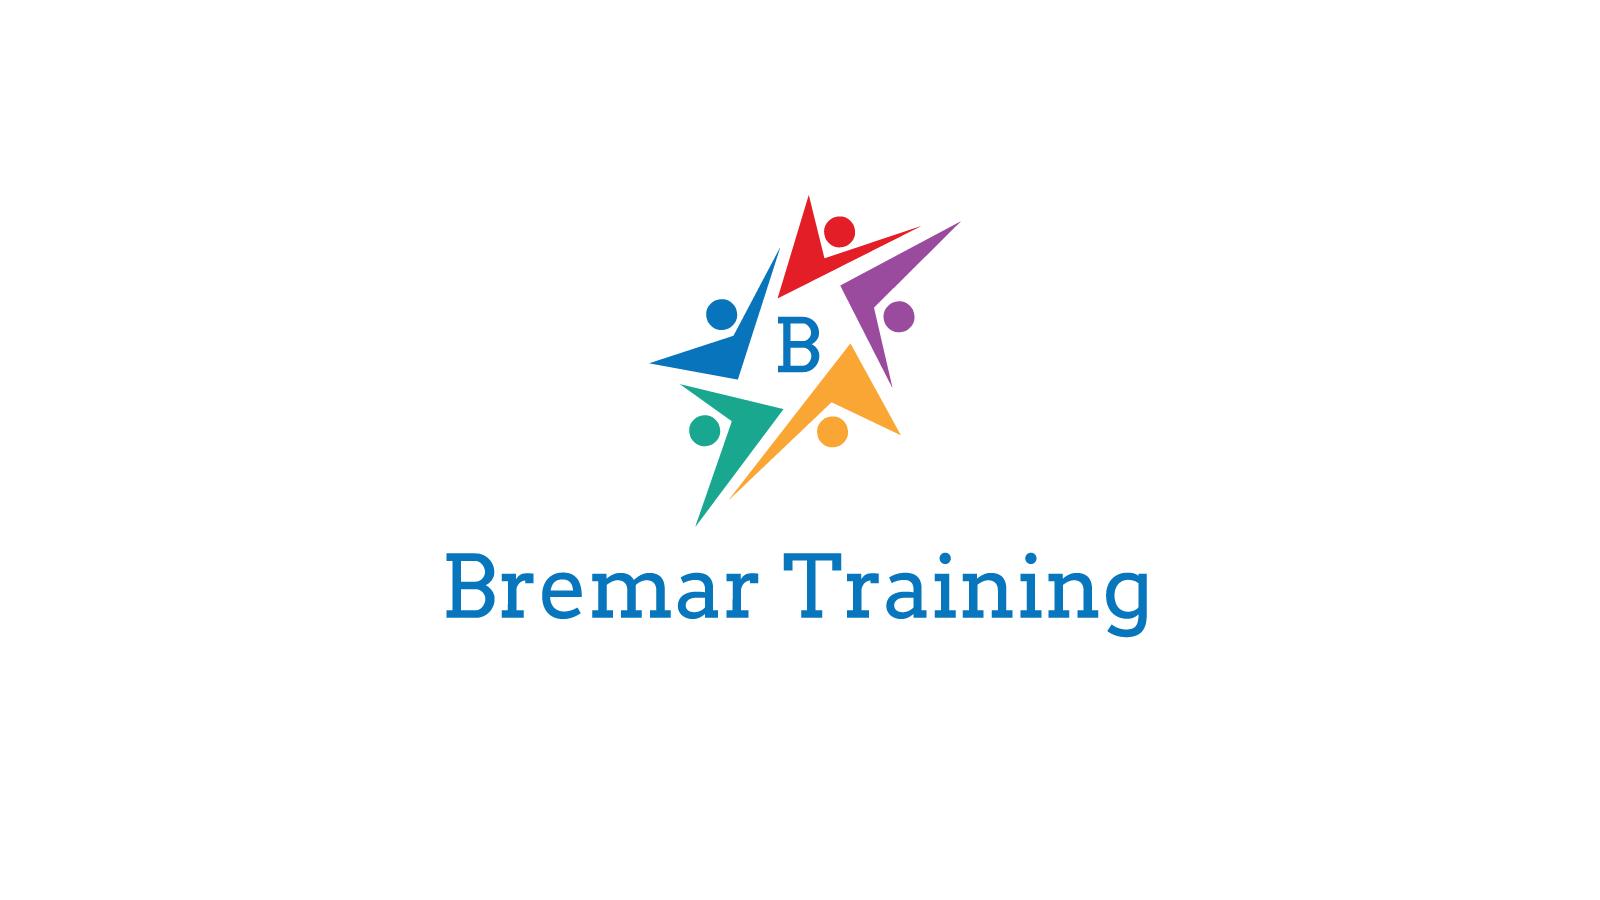 Bremar Training